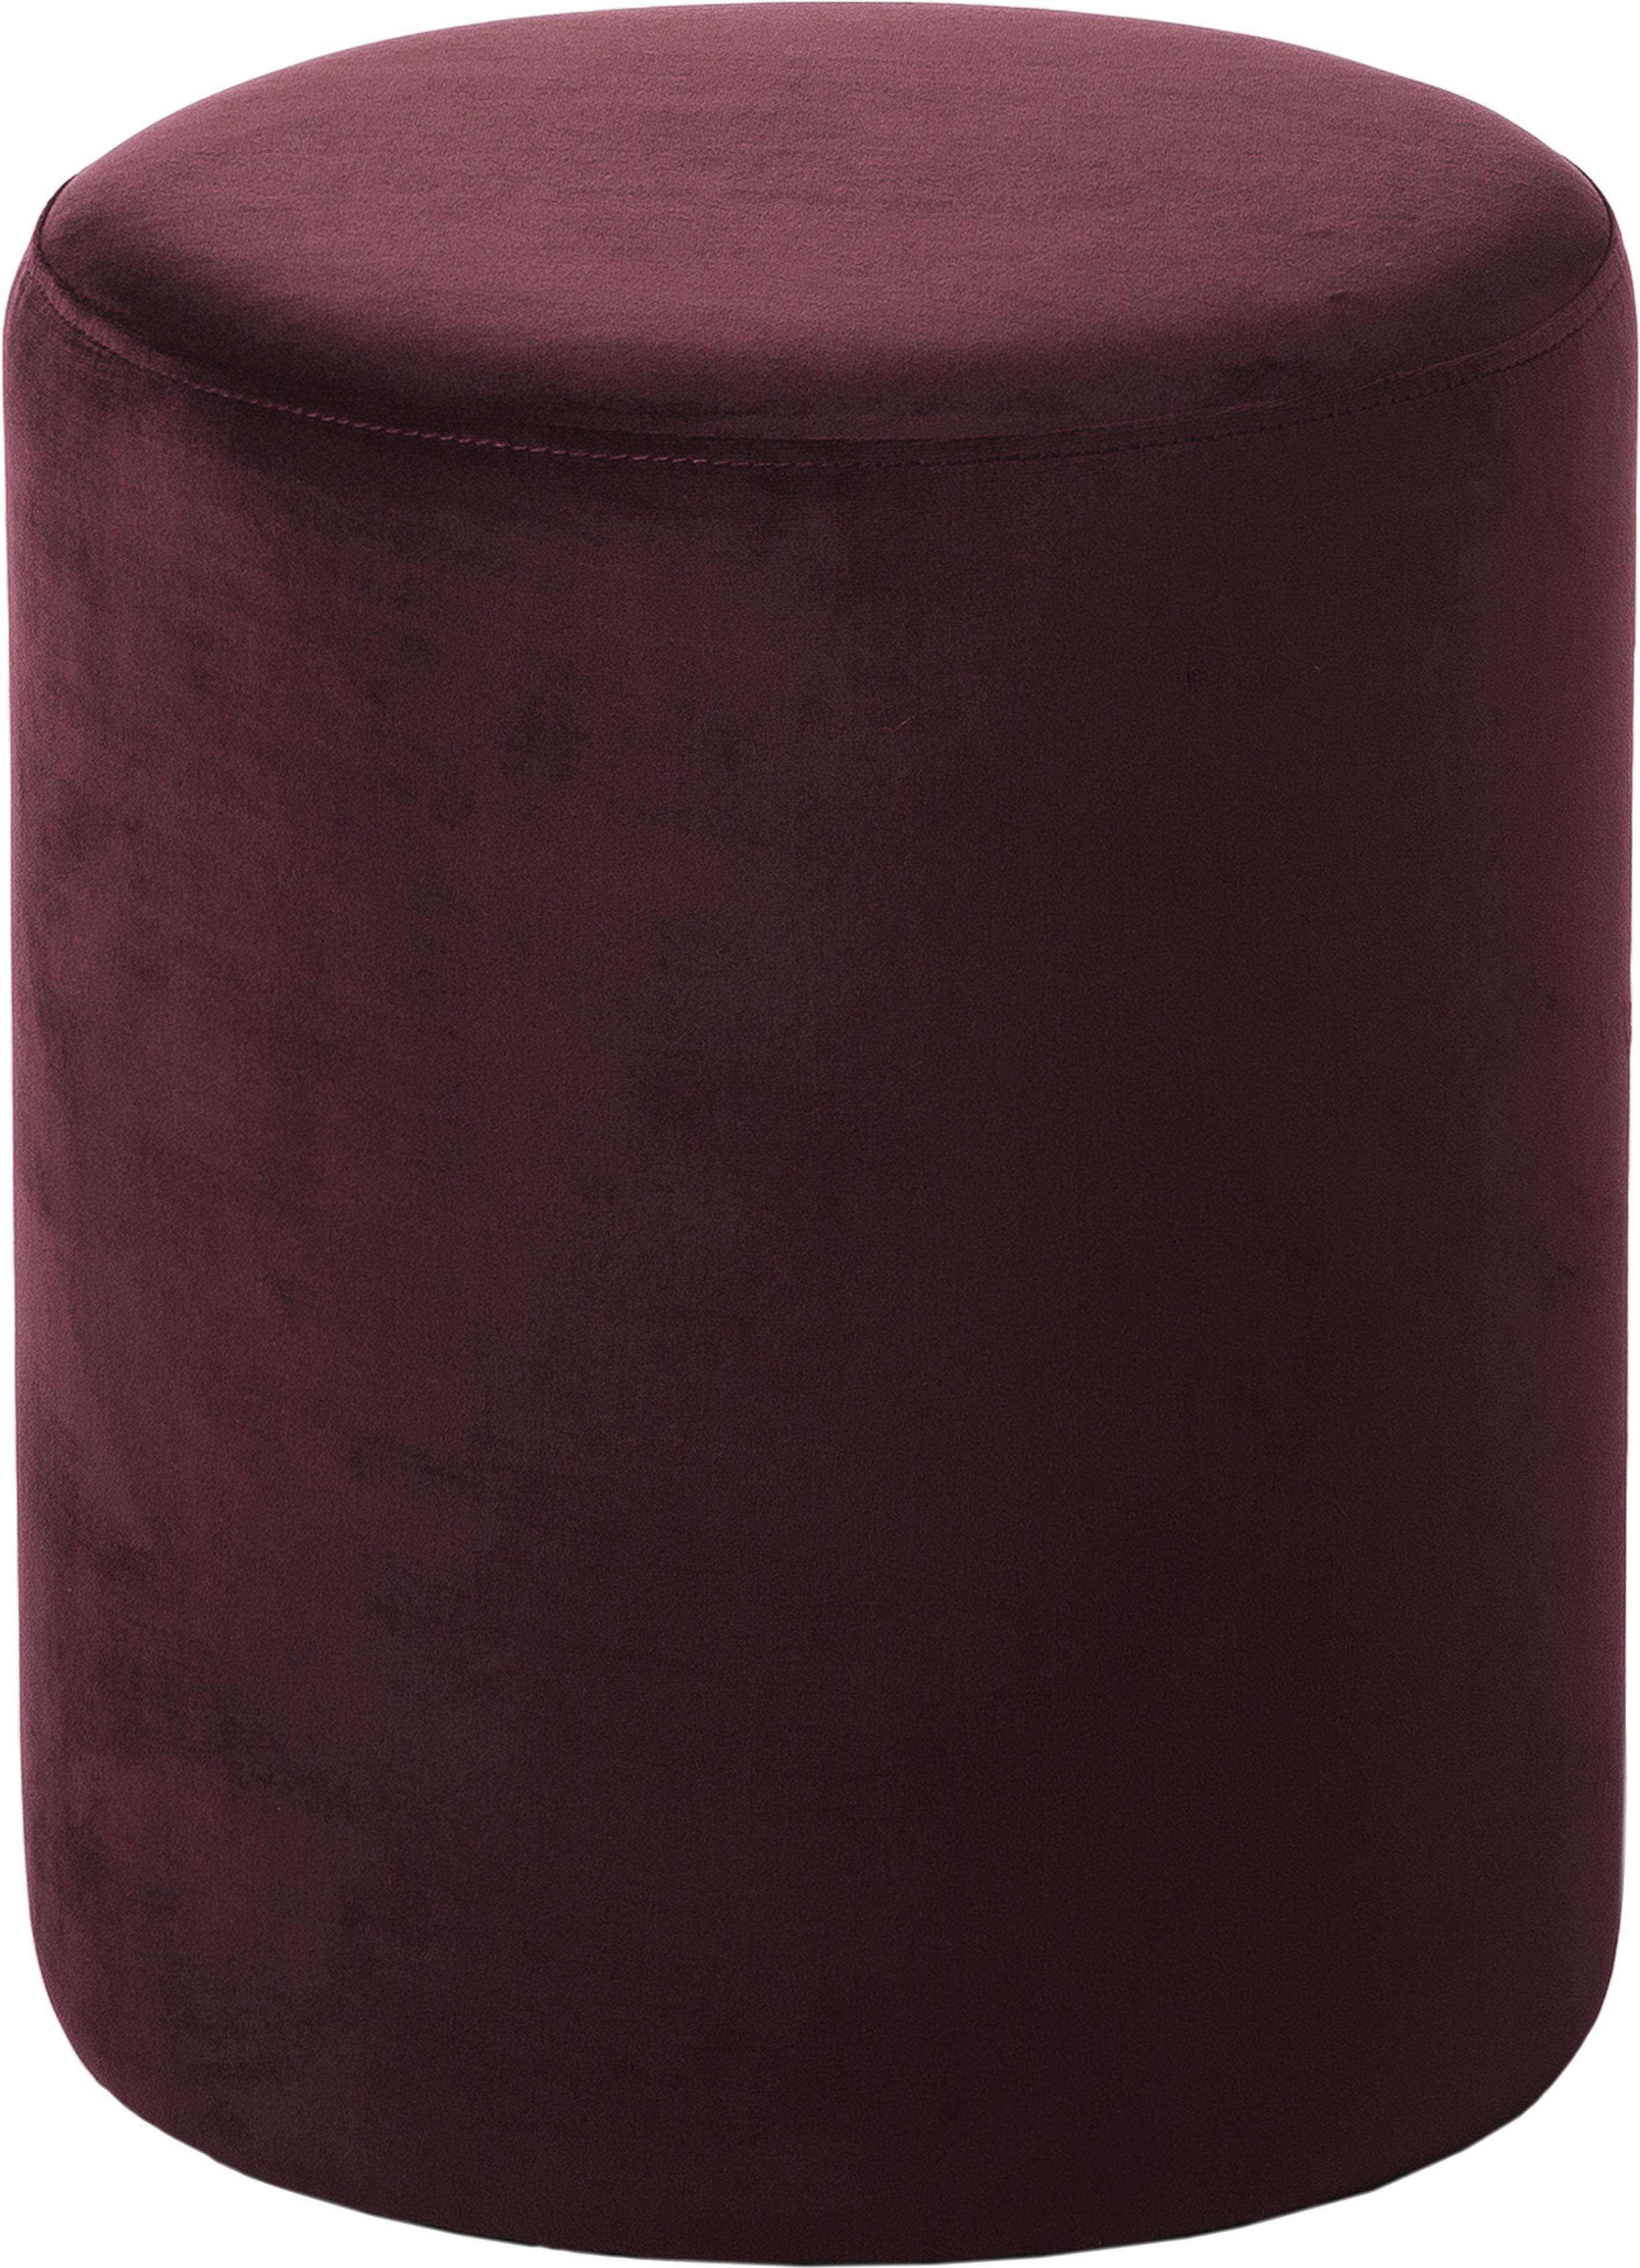 Samt-Hocker Daisy, Bezug: Samt (Polyester) 15.000 S, Rahmen: Mitteldichte Holzfaserpla, Samt Dunkelrot, ∅ 38 x H 45 cm